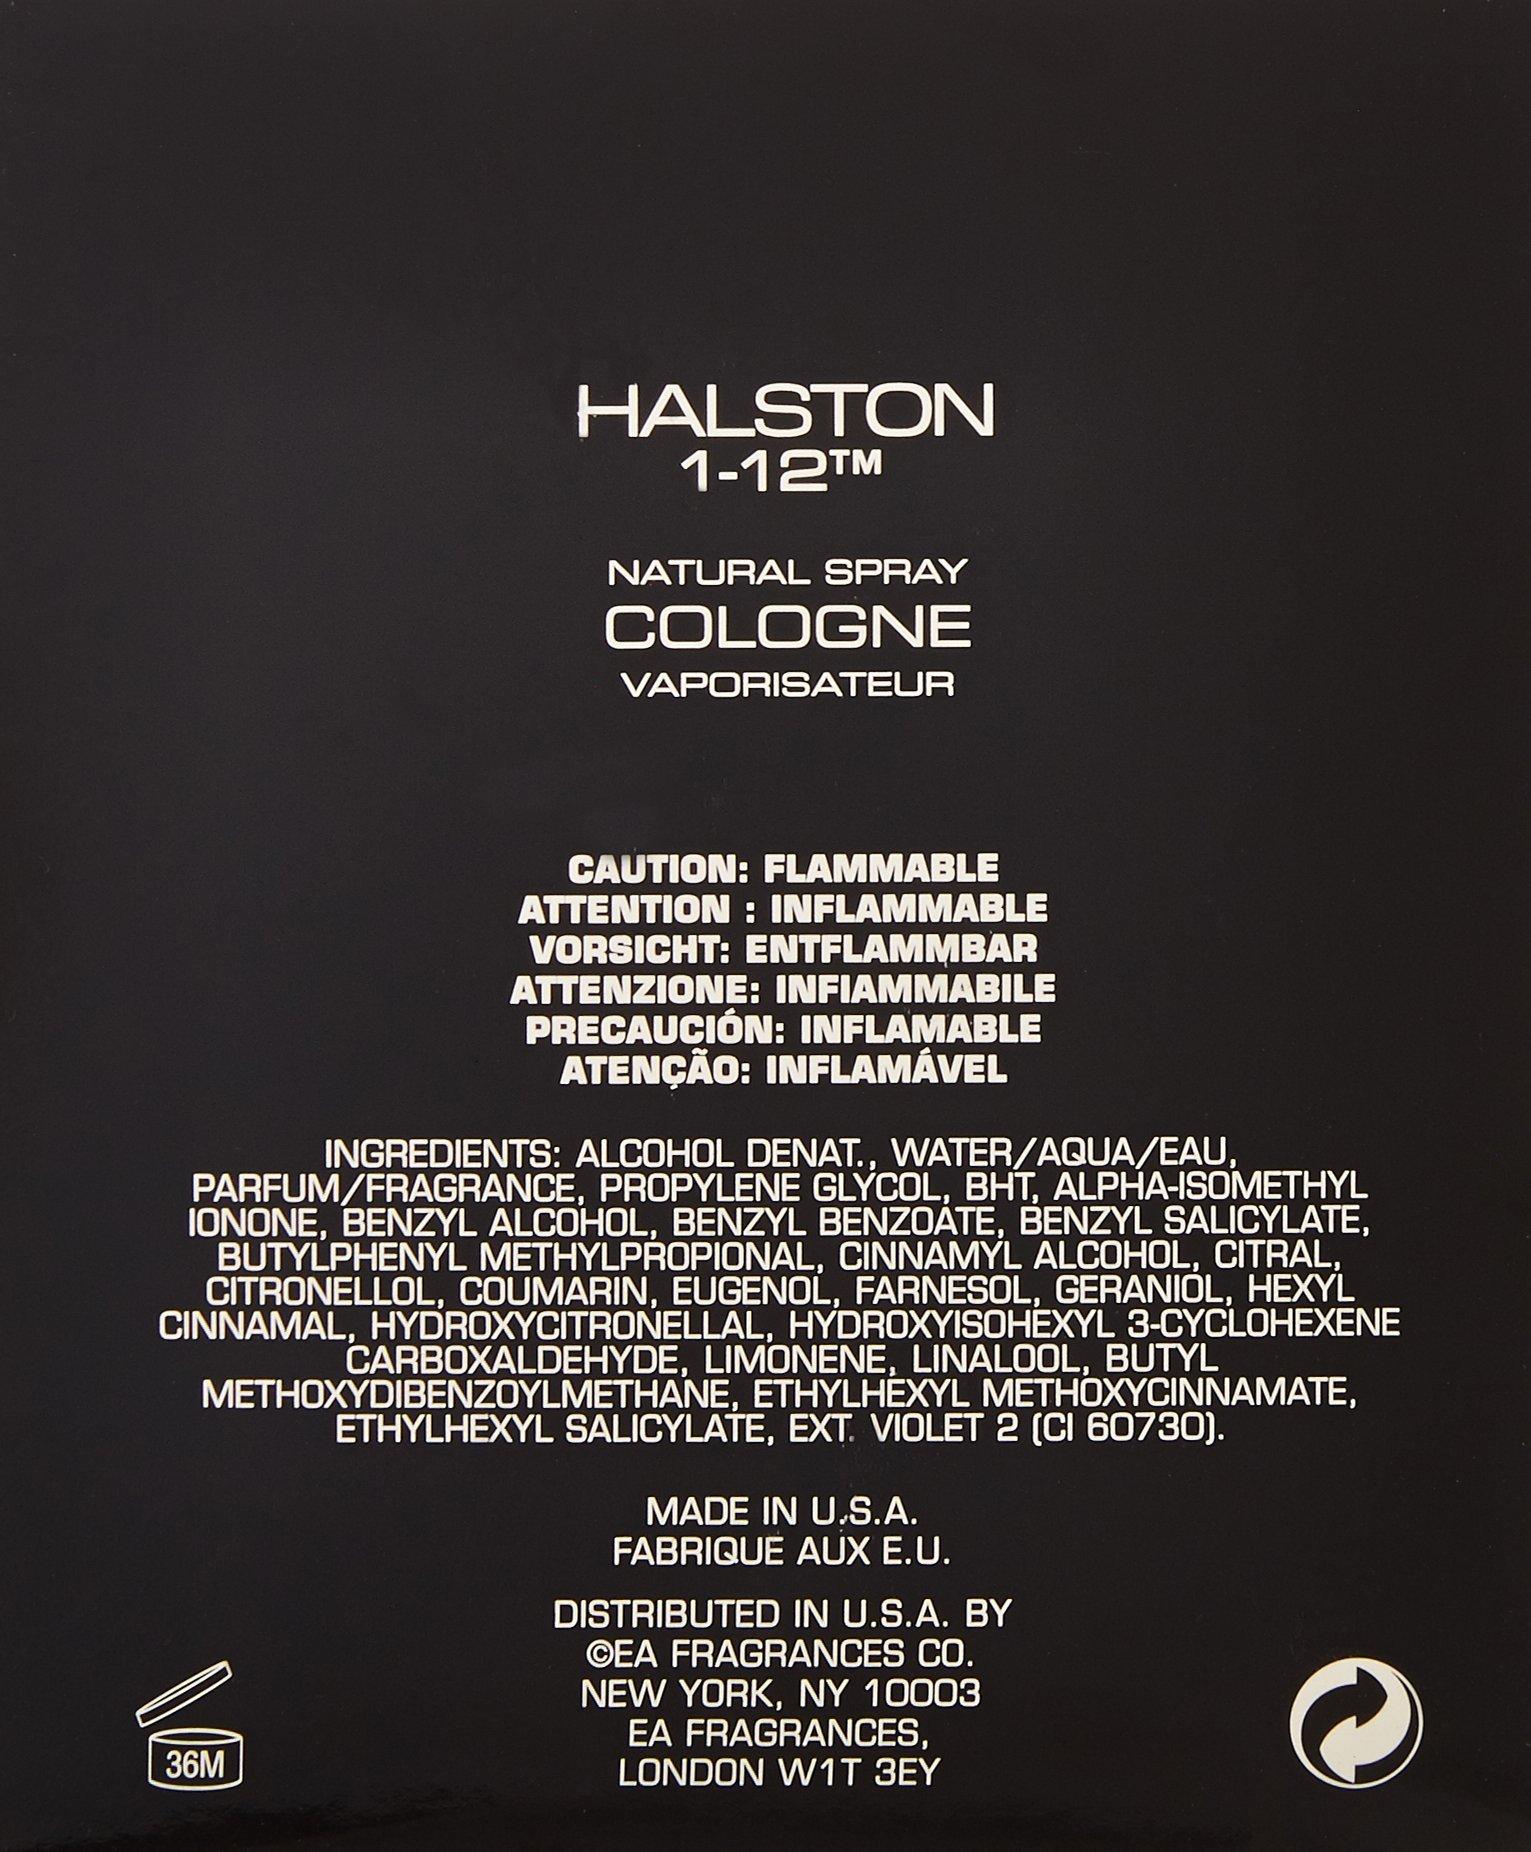 Halston 1-12 by Halston for Men 4.2 oz Cologne Spray by Halston (Image #2)